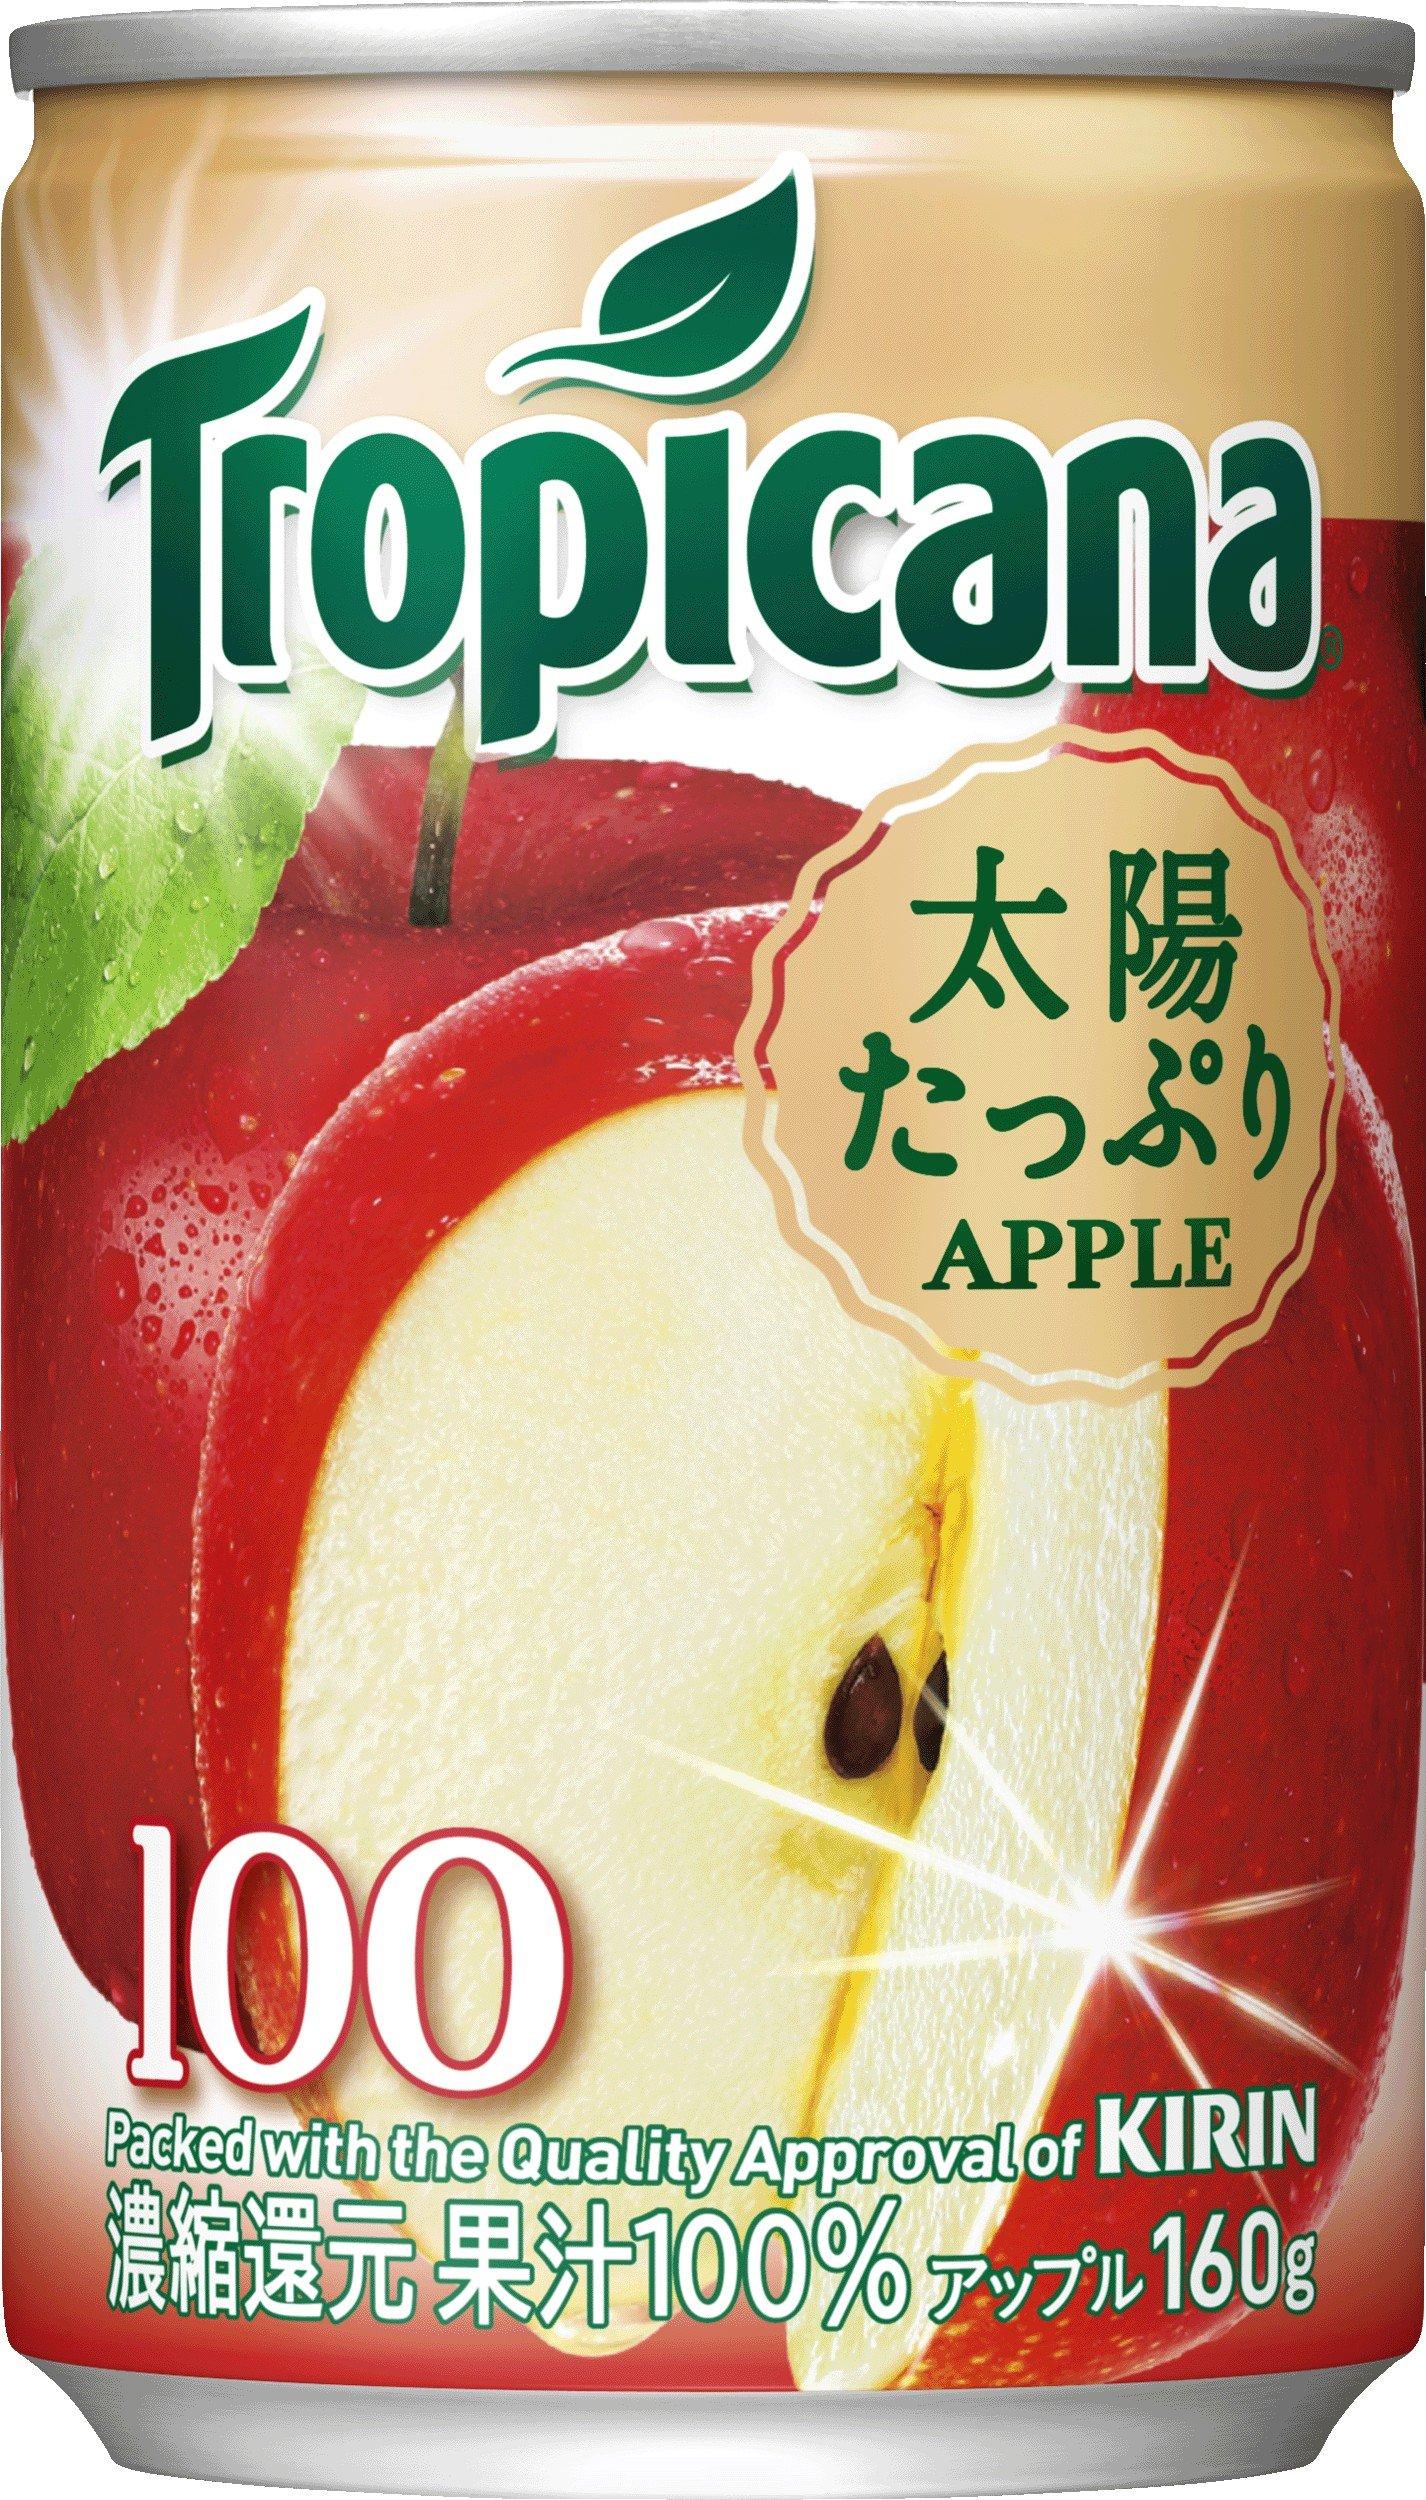 160gX30 this Tropicana 100% apple